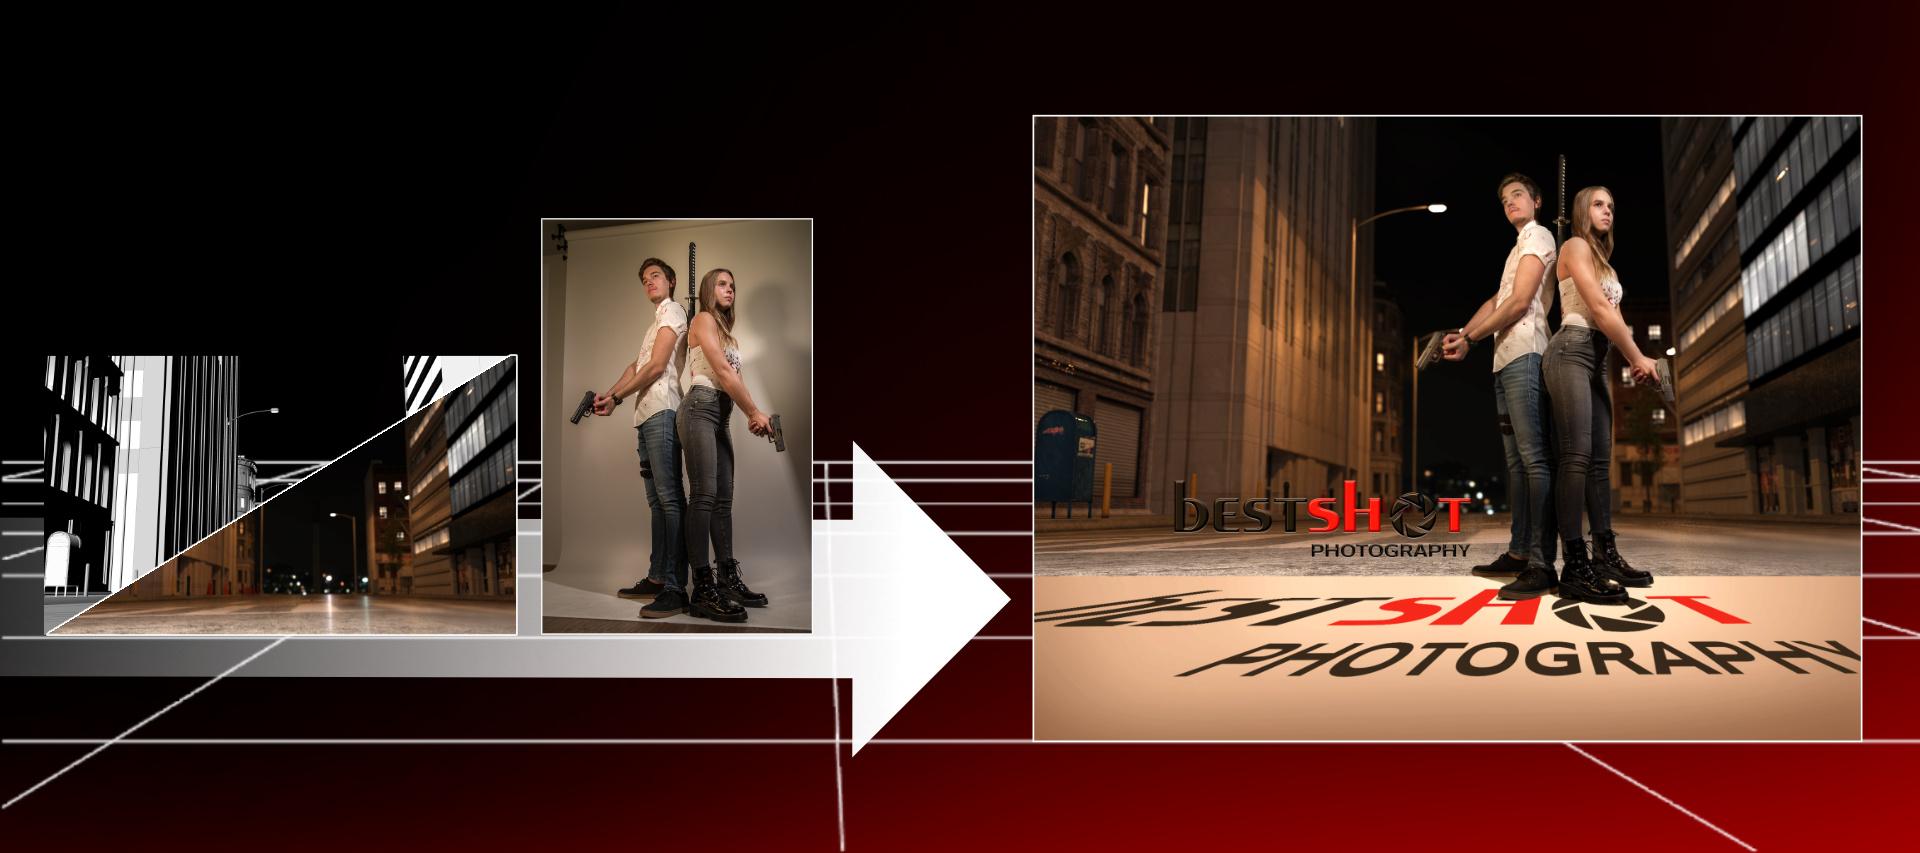 Fotomontage Composing Bestshot-Photography